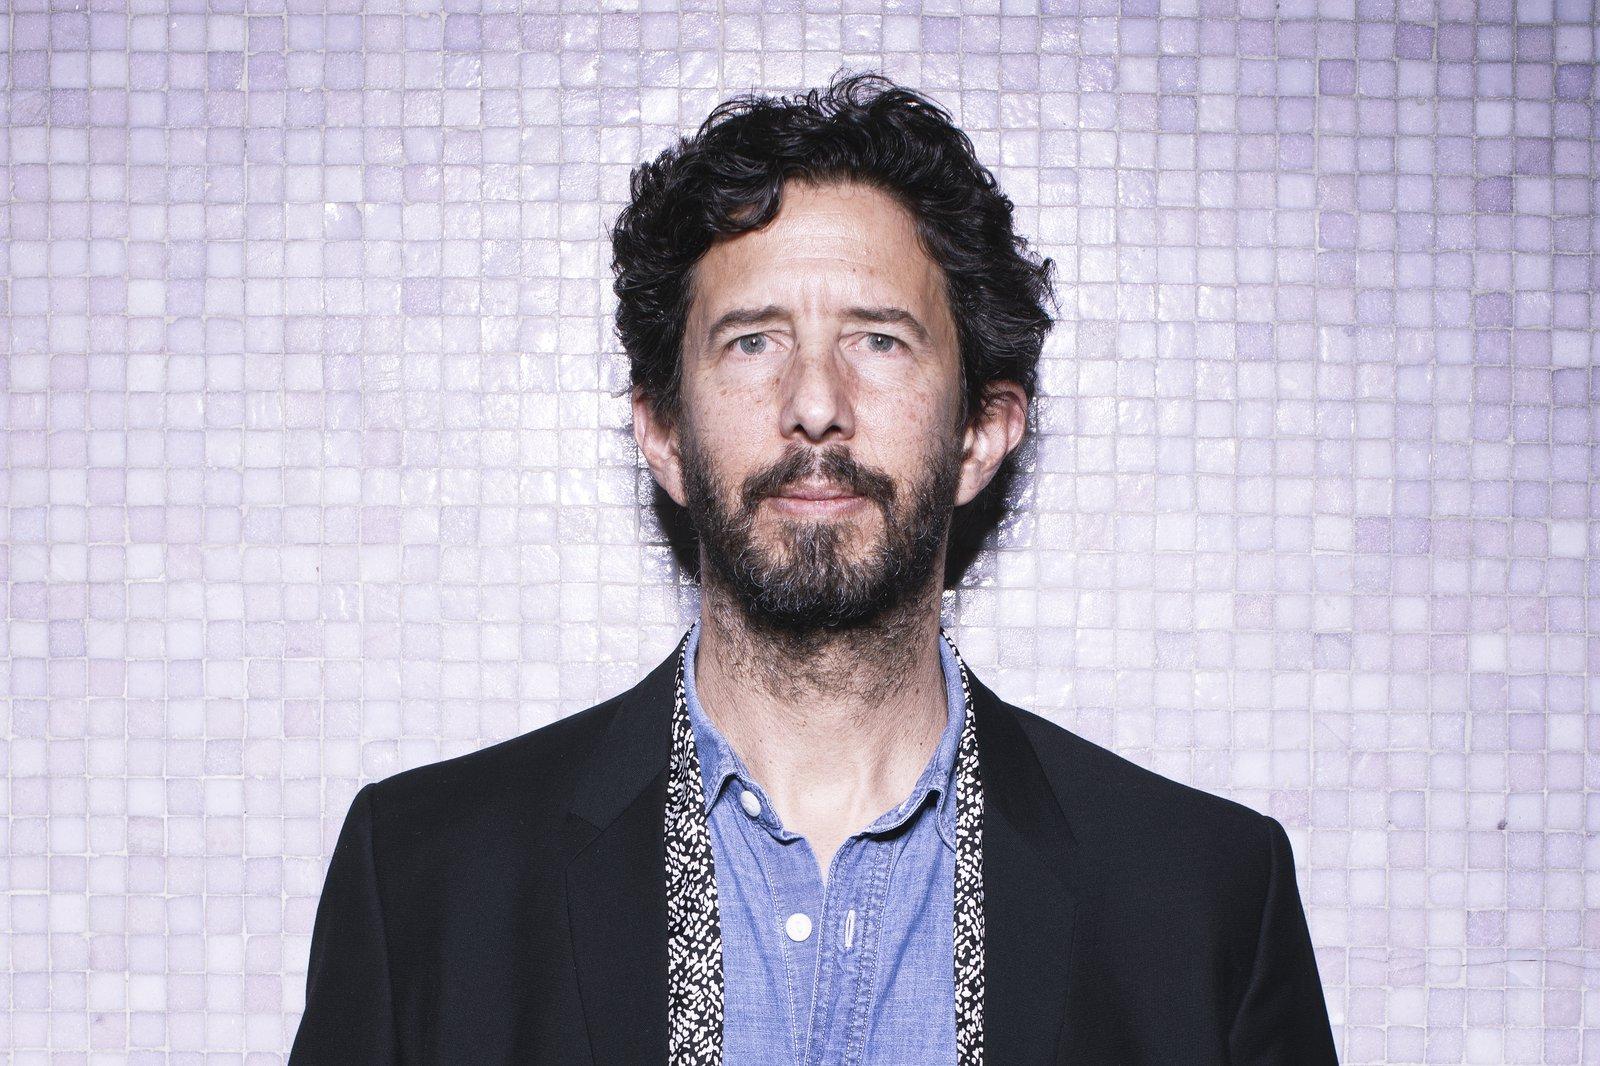 José Roca, Artistic Director of the 23rd Biennale of Sydney.